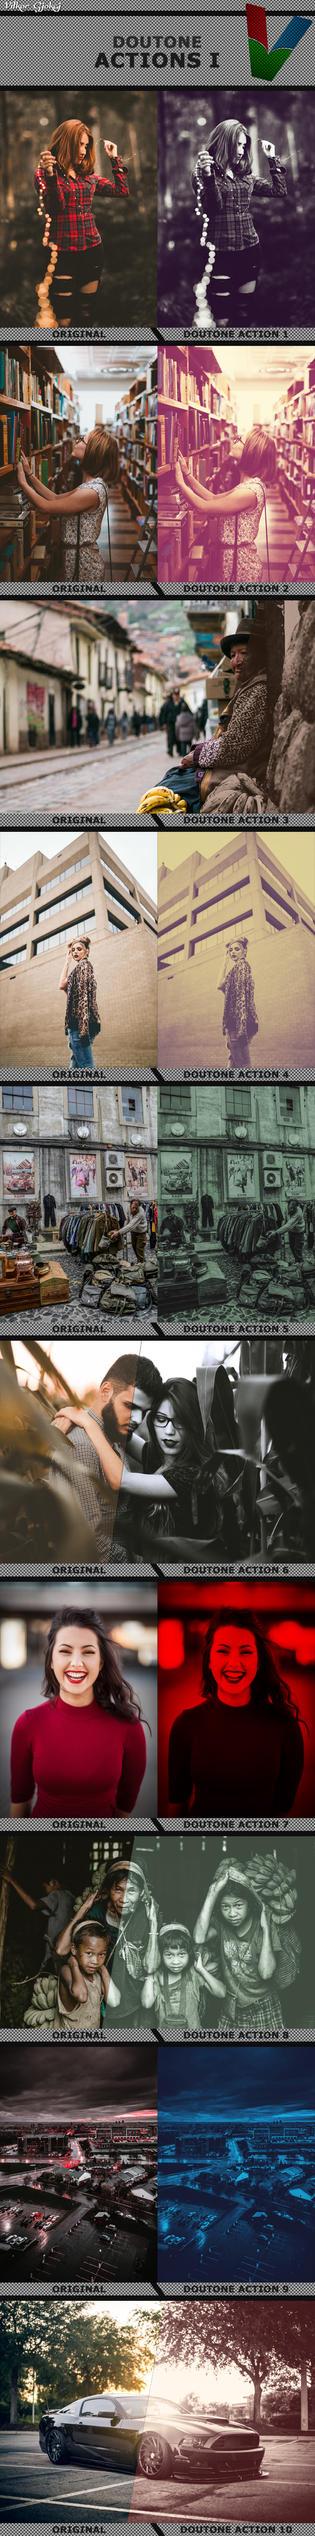 Doutone Actions 2 by ViktorGjokaj